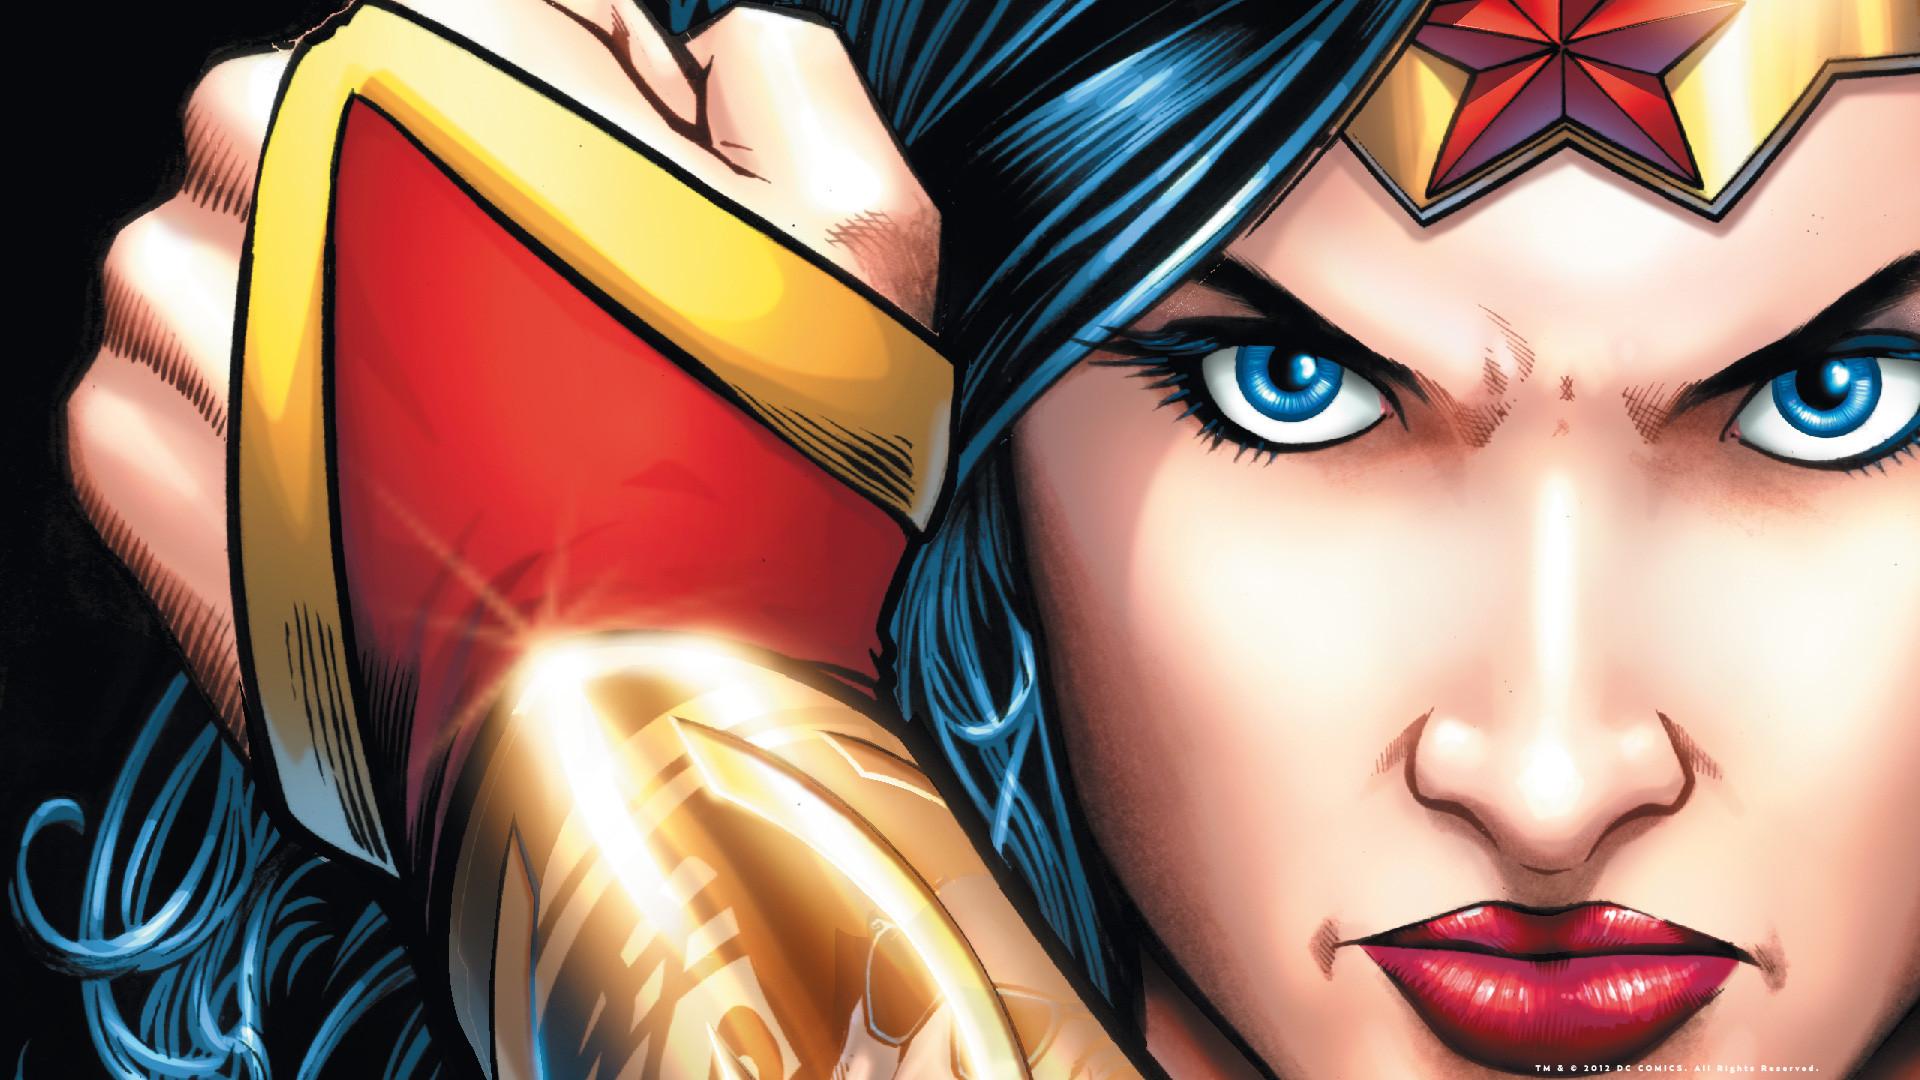 Res: 1920x1080, Wonder Woman Wallpaper